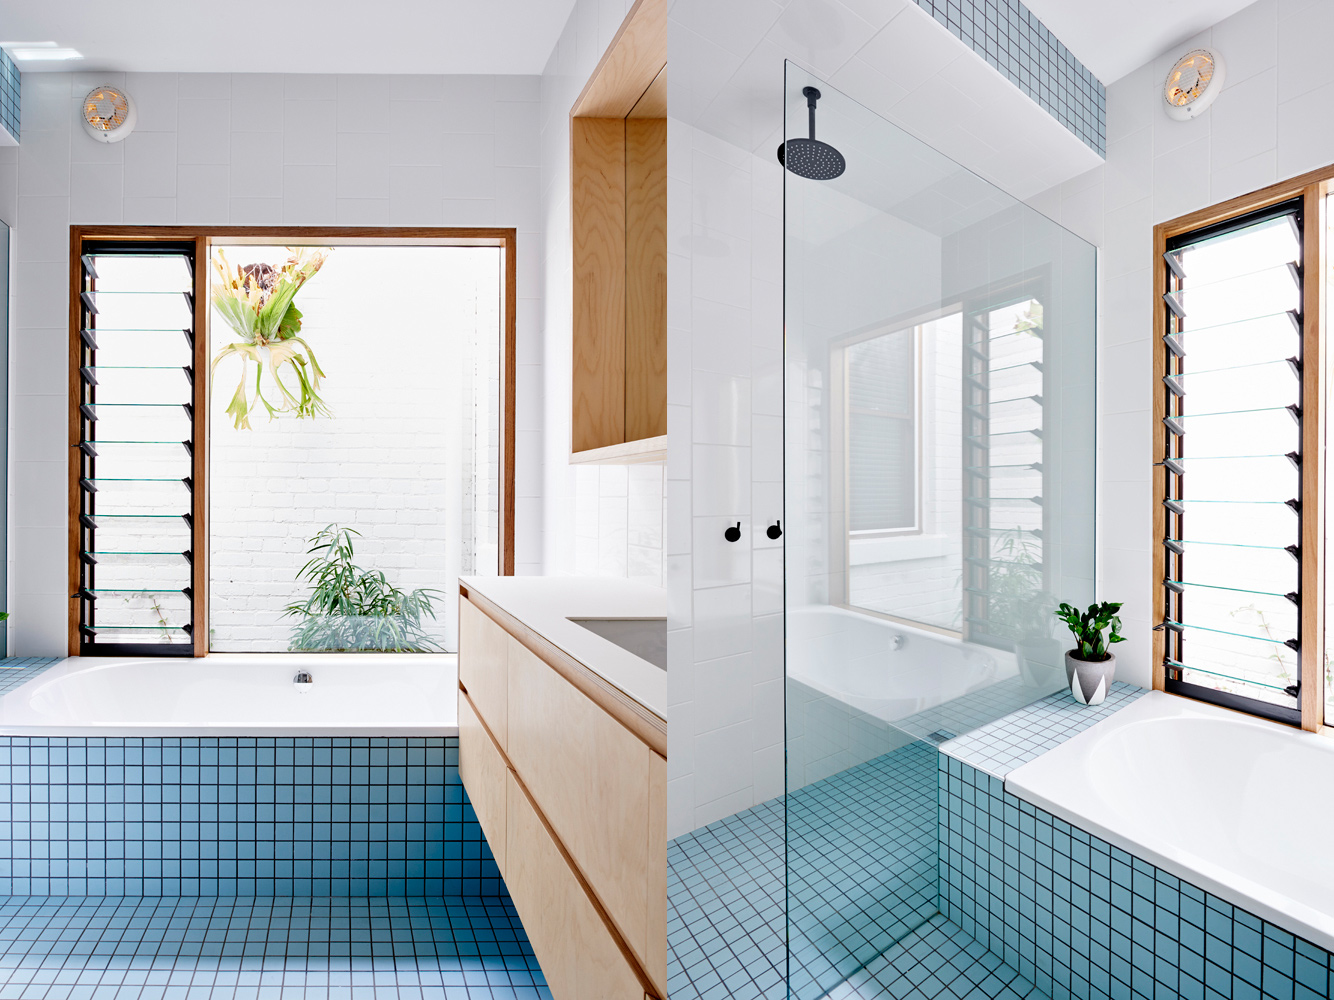 High House - Local Bathroom Timber - Dan Gayfer Design - Interior Archive